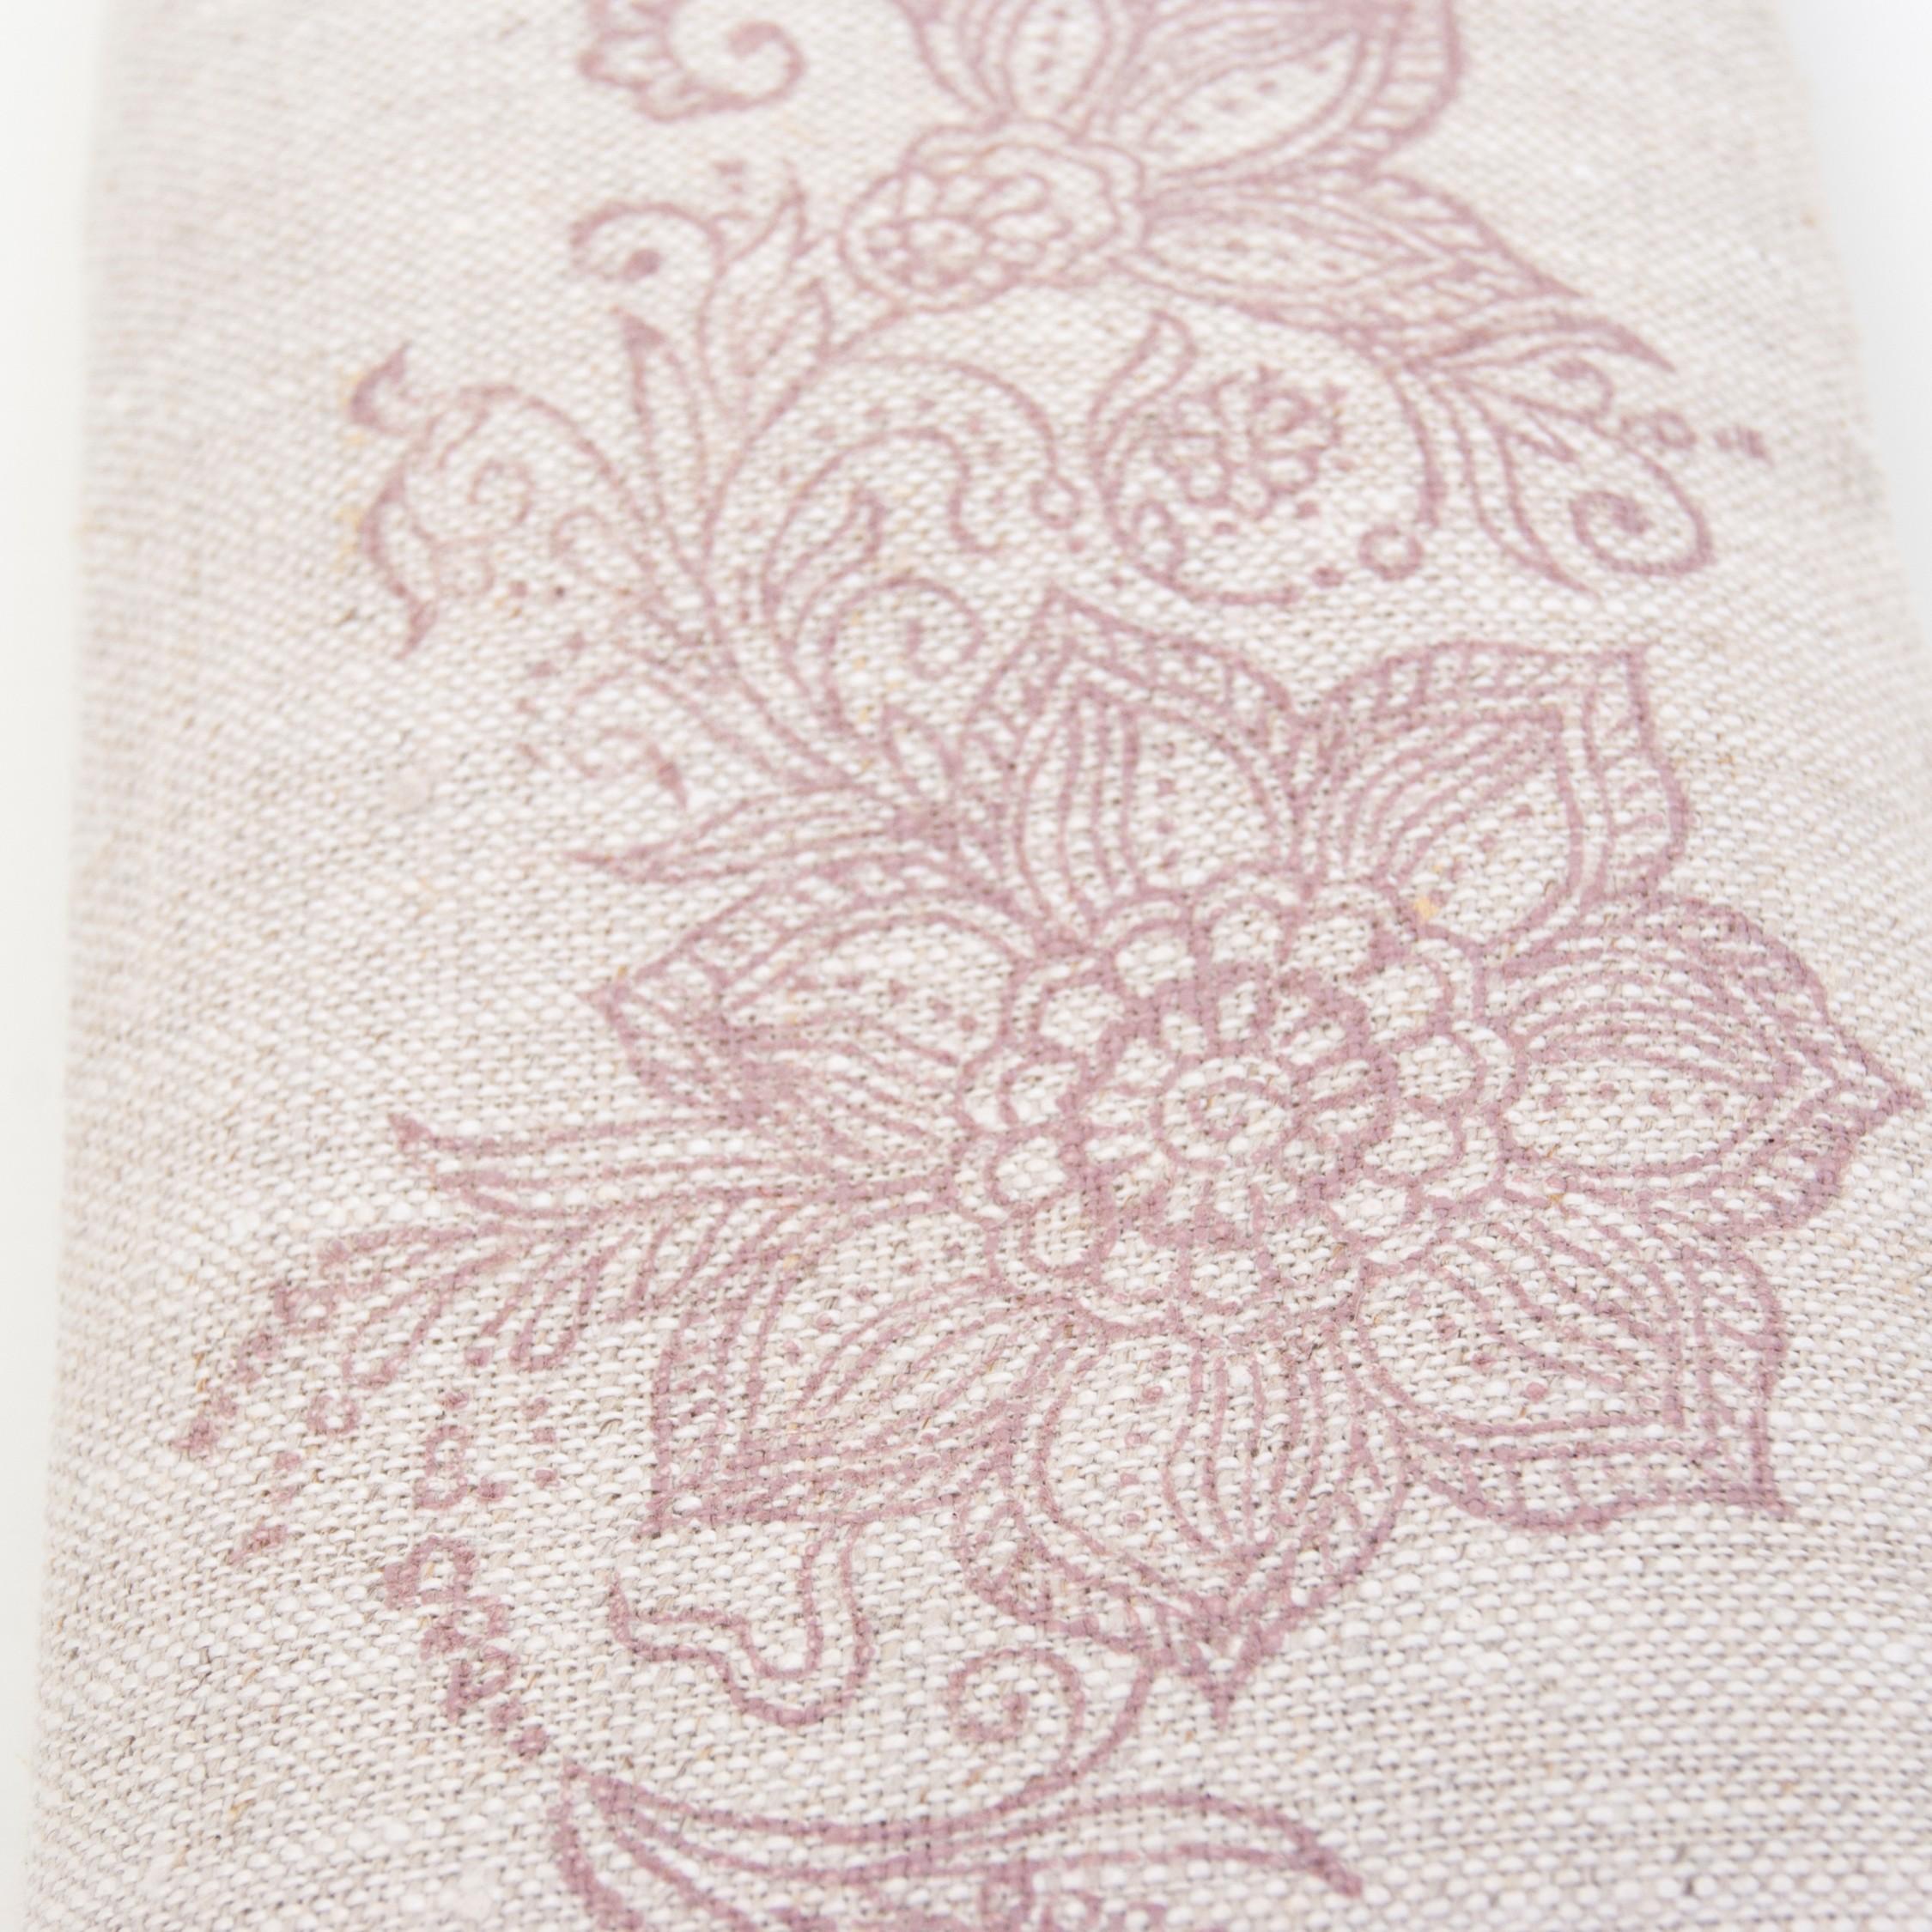 Handprinted lavender eye pillow Mehndi